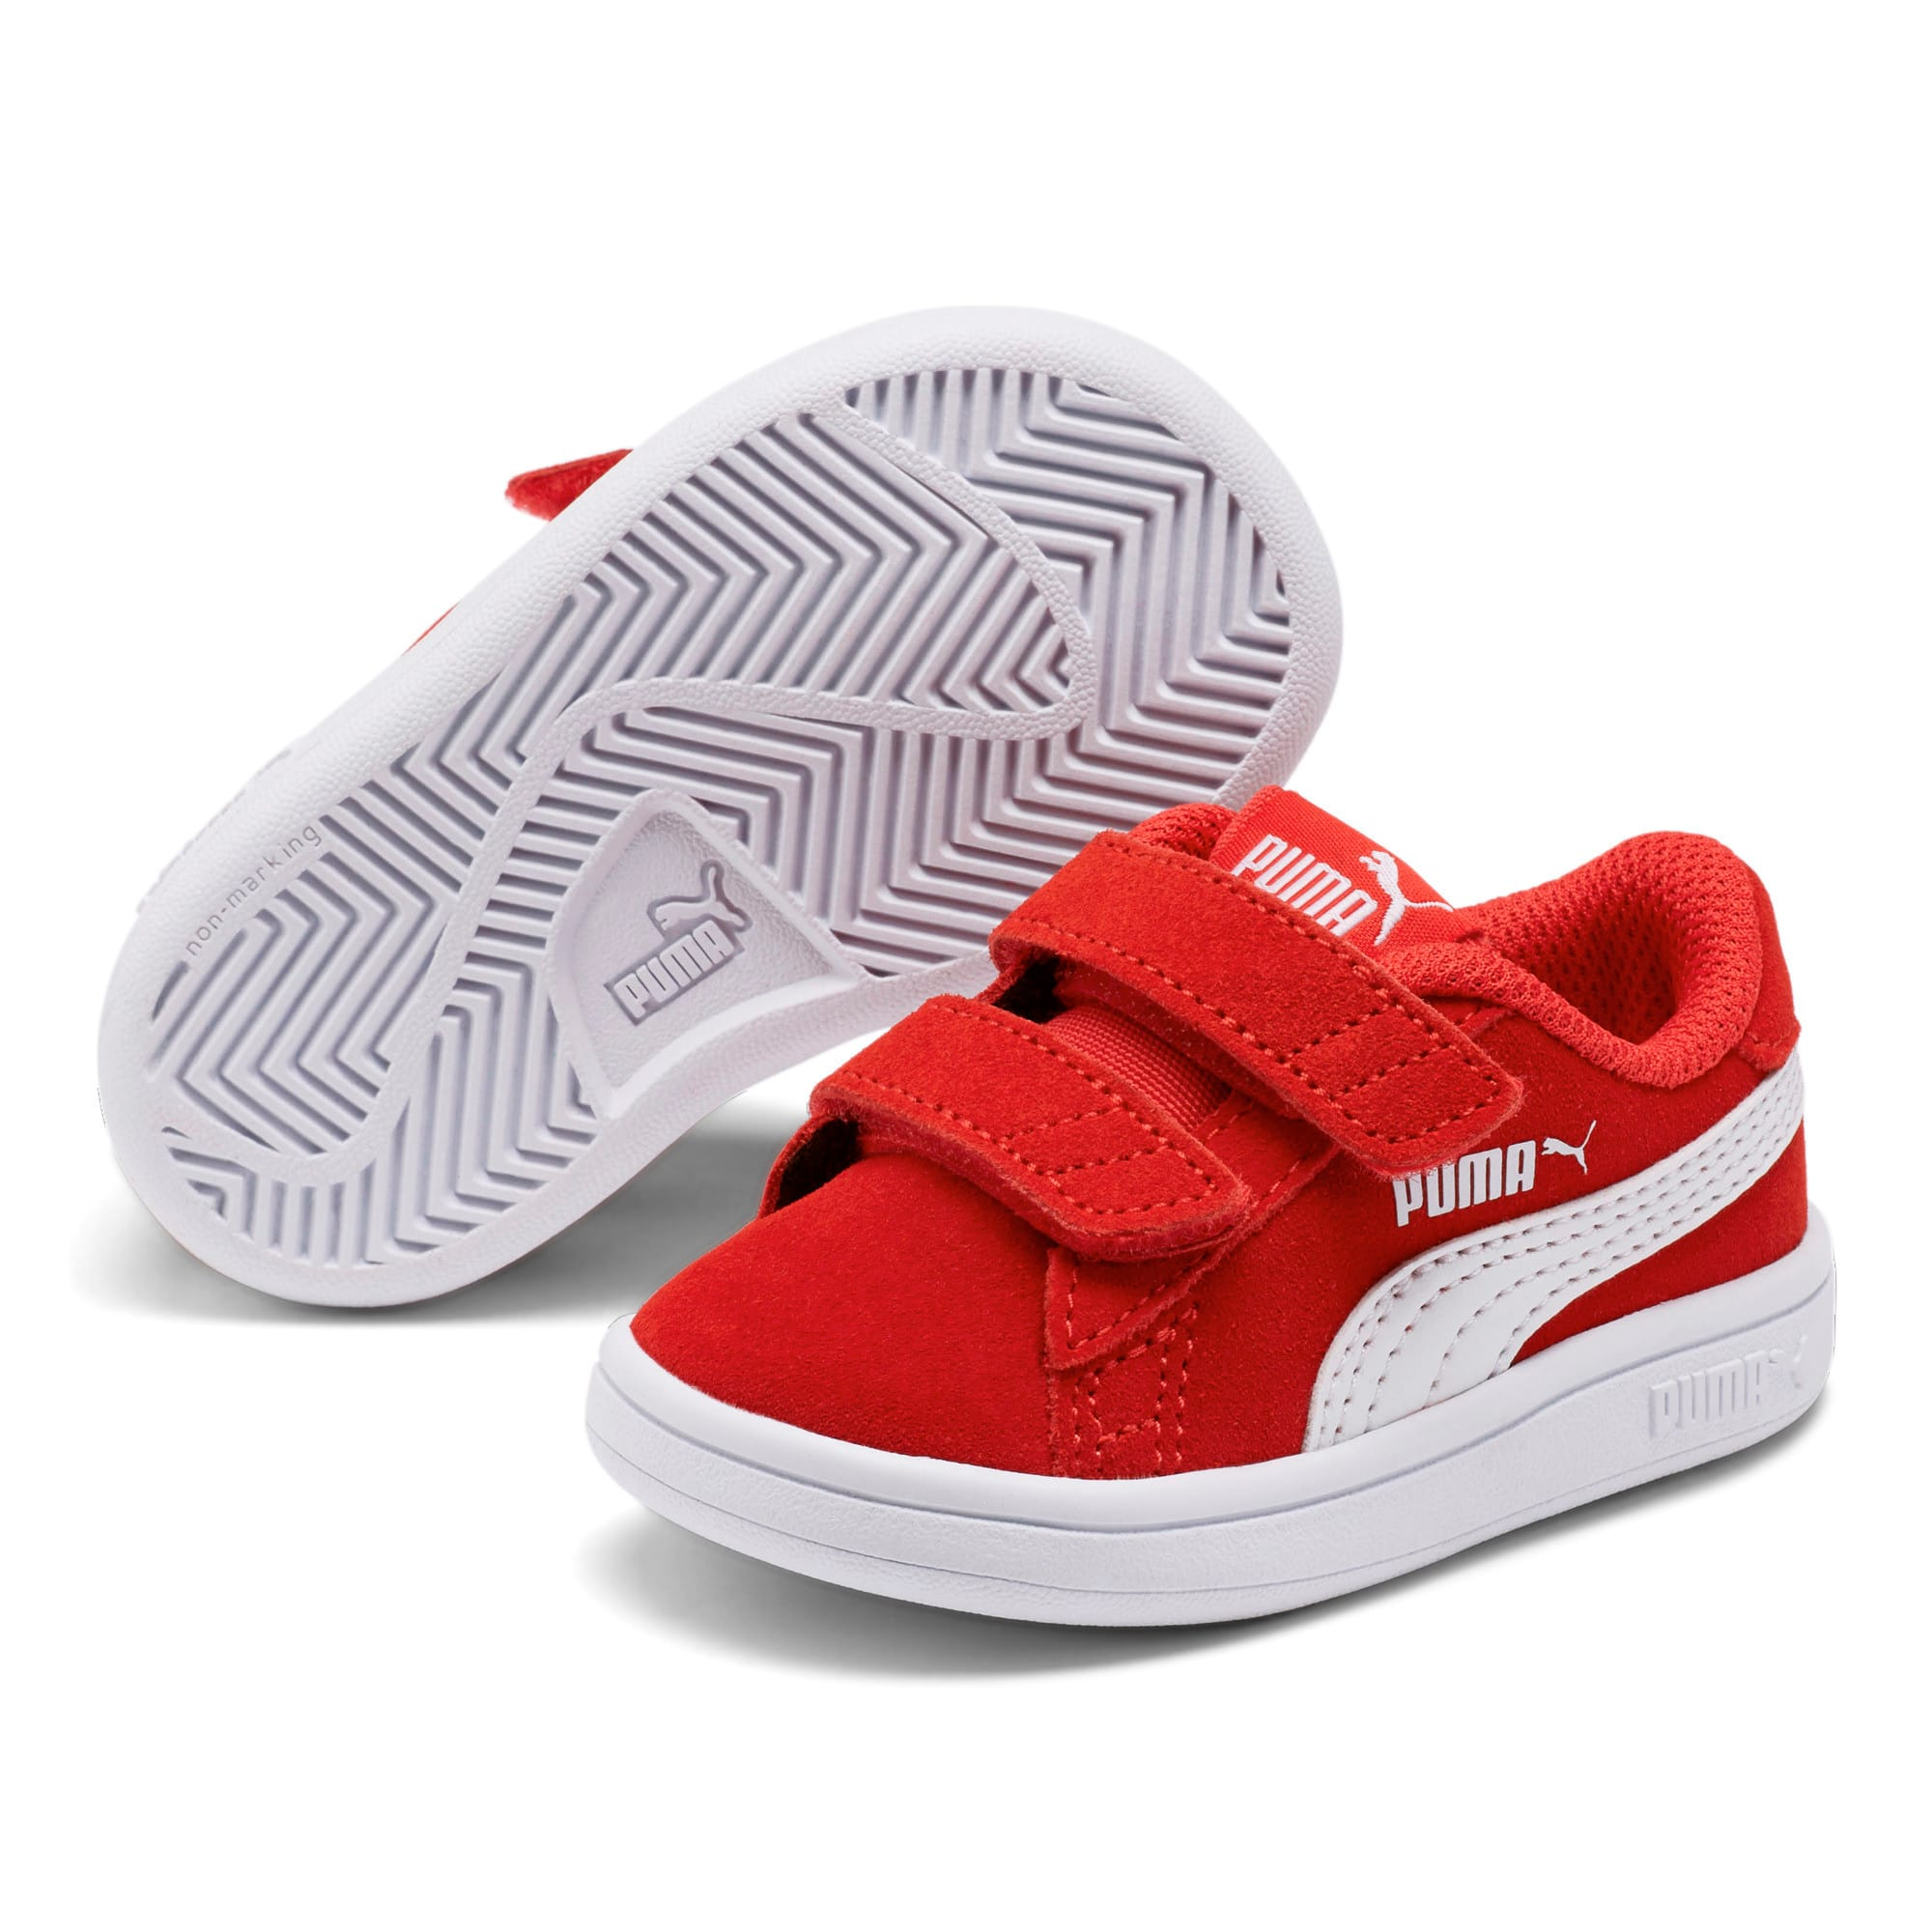 Thumbnail 2 of PUMA Smash v2 Suede Toddler Shoes, High Risk Red-Puma White, medium